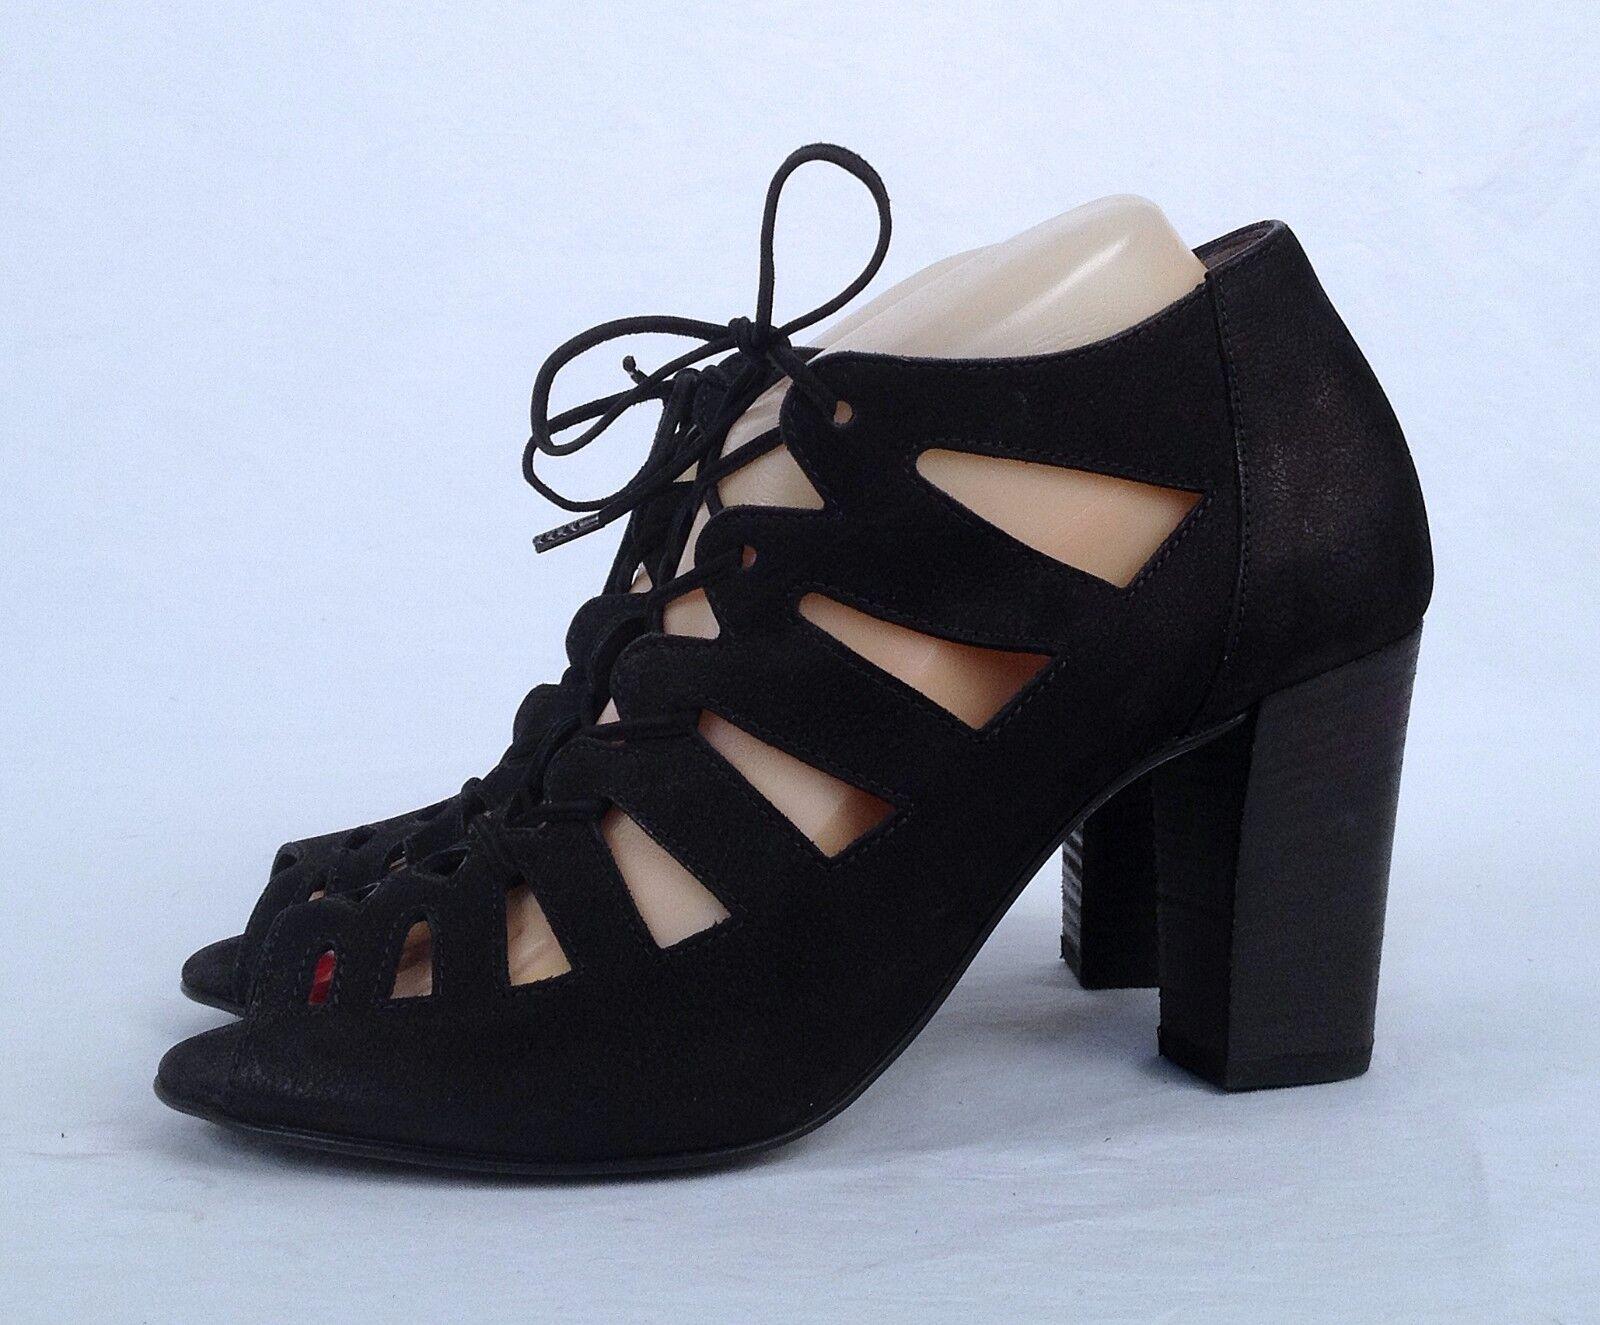 Paul verde  Paulina  Sandal- nero - - - Retail   350  (B41) 0fc62d